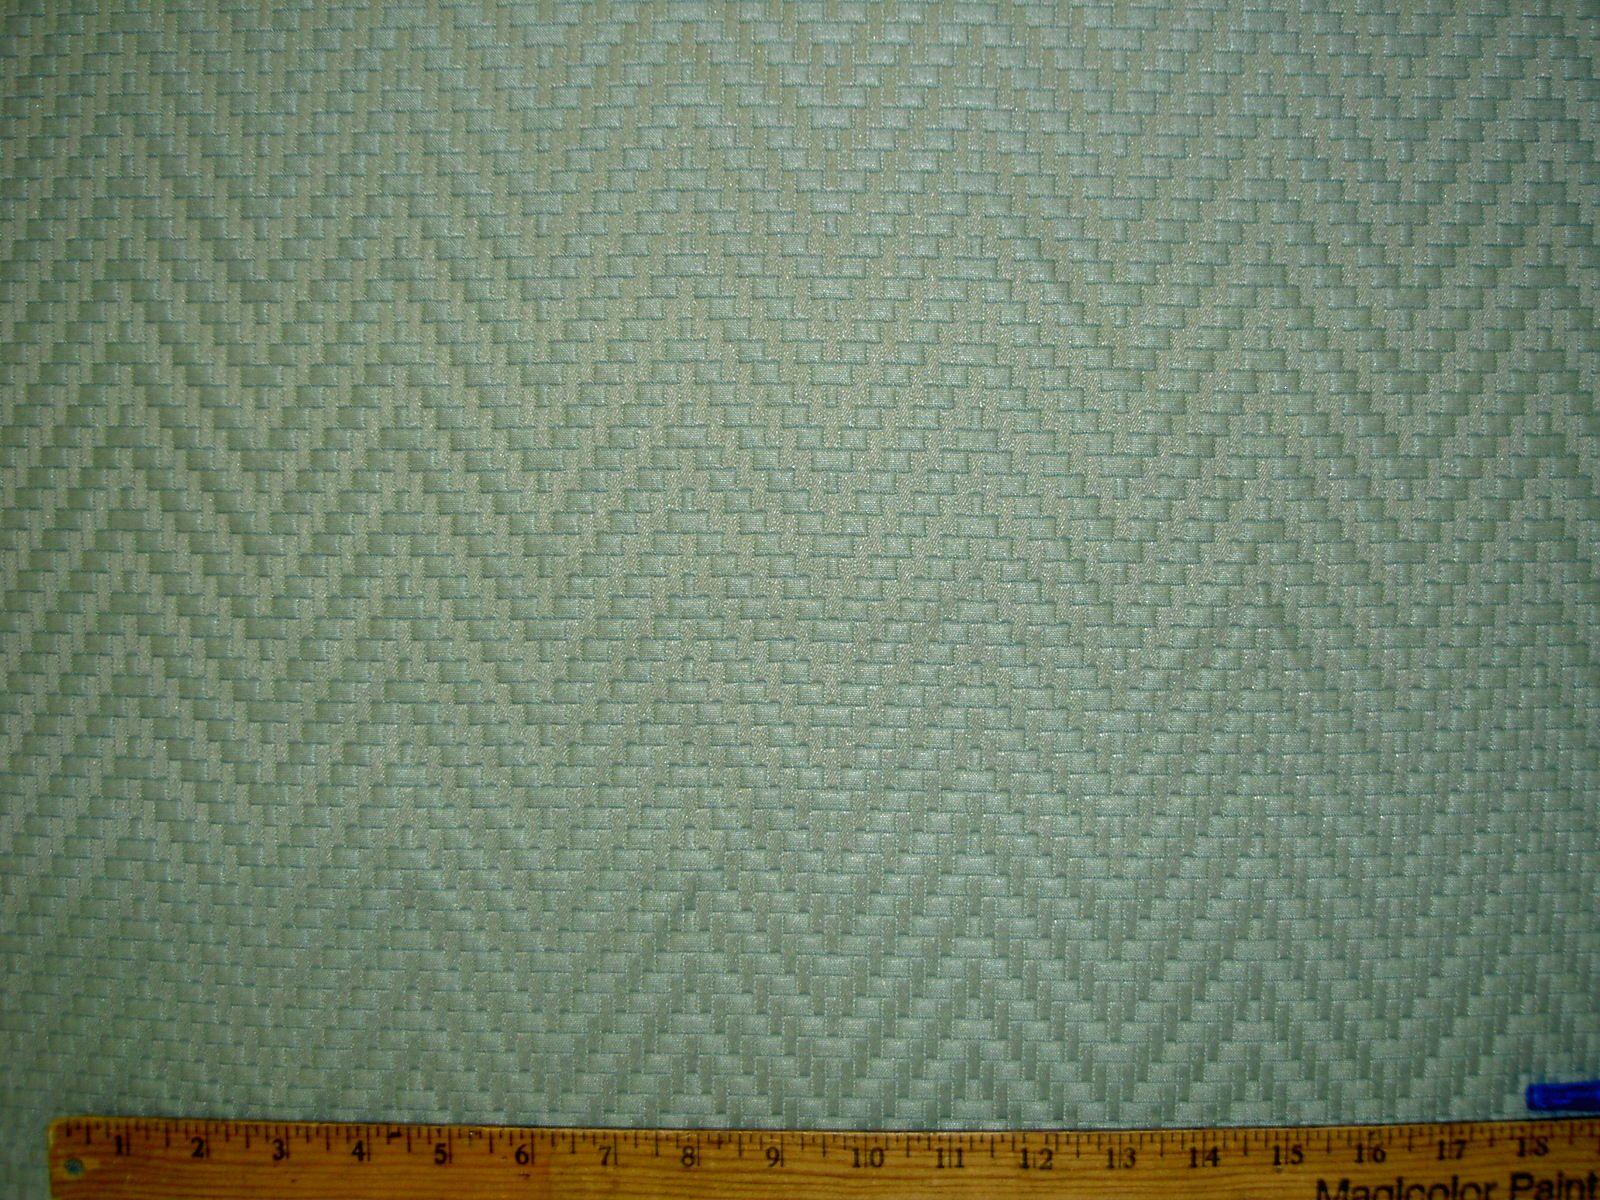 ocean upholstery fabric sample of this Home Decor designer